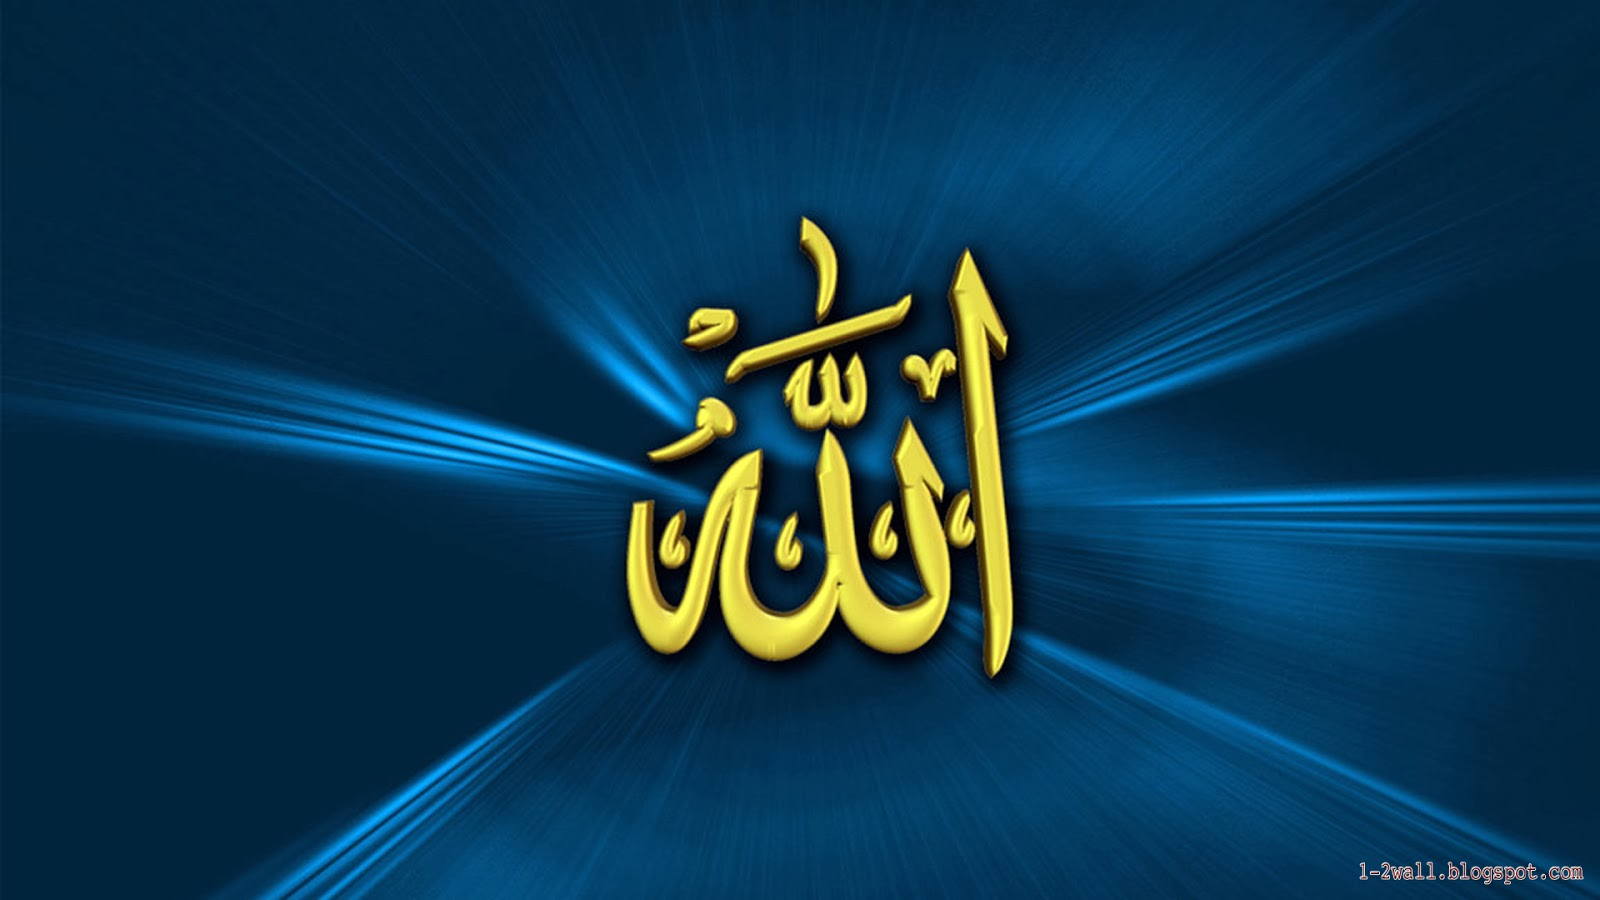 Allah Names HD Wallpapers, Islamic Wallpapers   1-2Wall